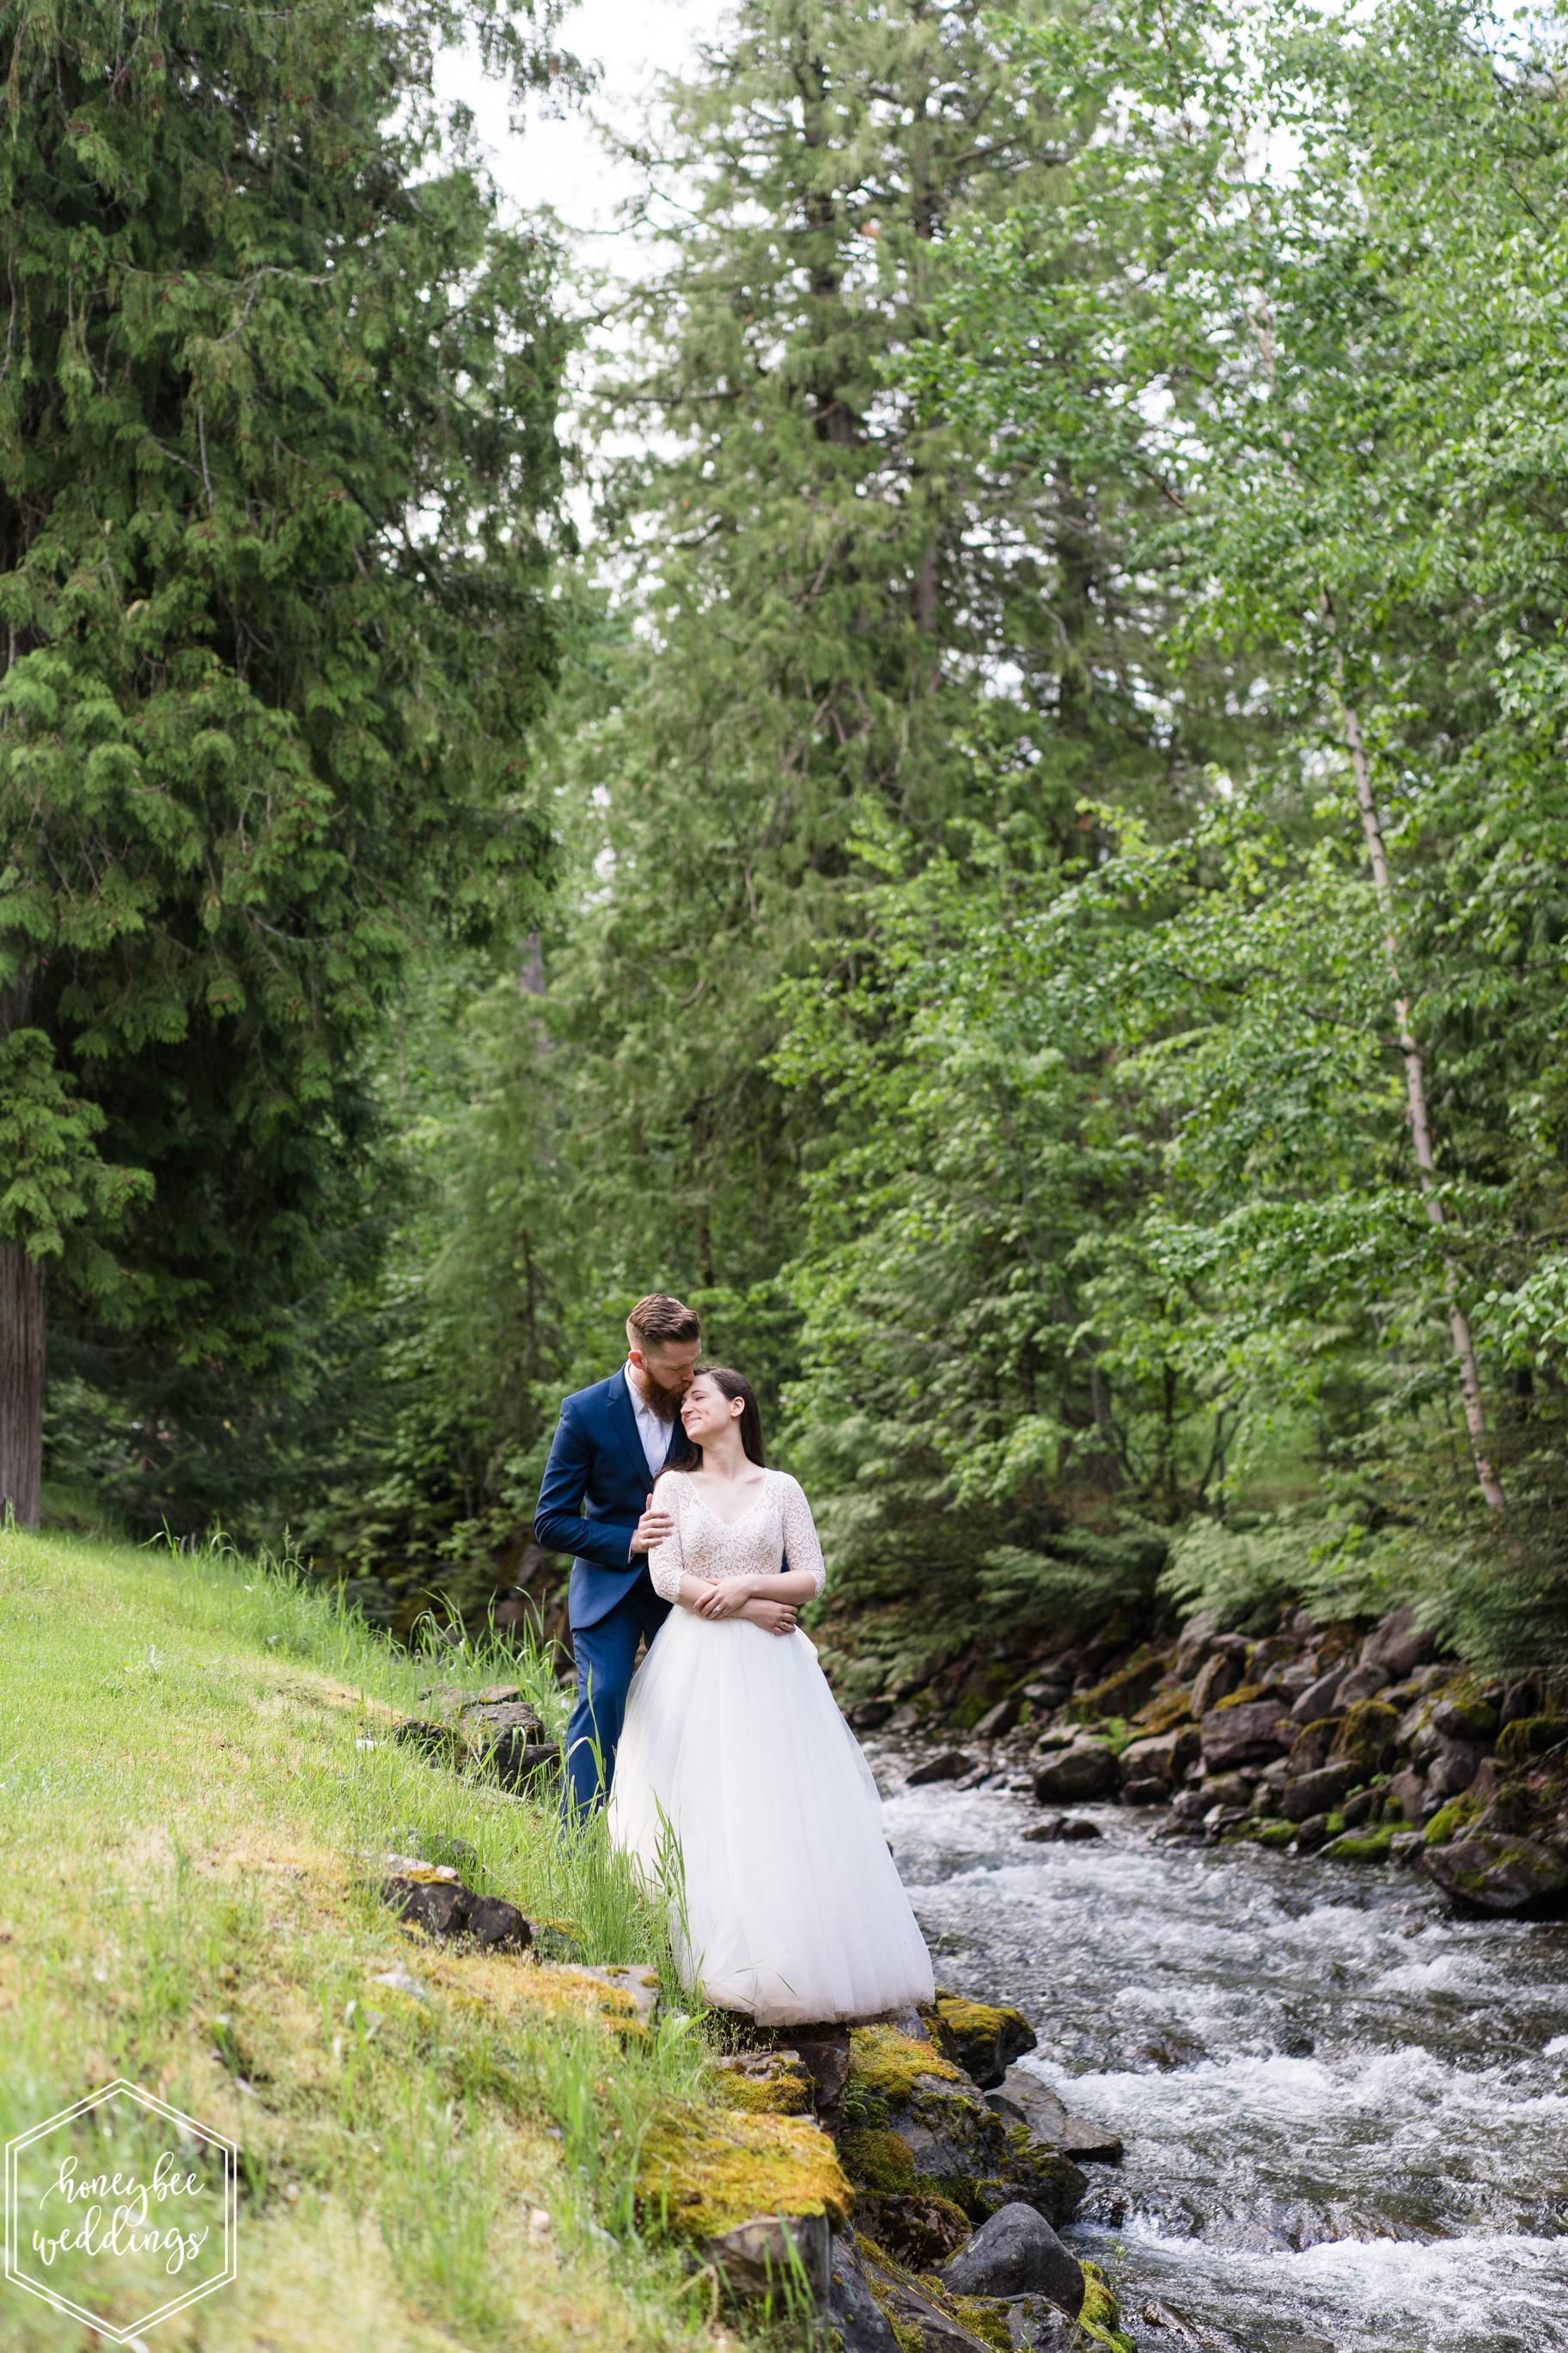 251Glacier National Park Wedding_Izaak Walton Inn Wedding_Honeybee Weddings_Norah & Kyle_June 09, 2019-73.jpg